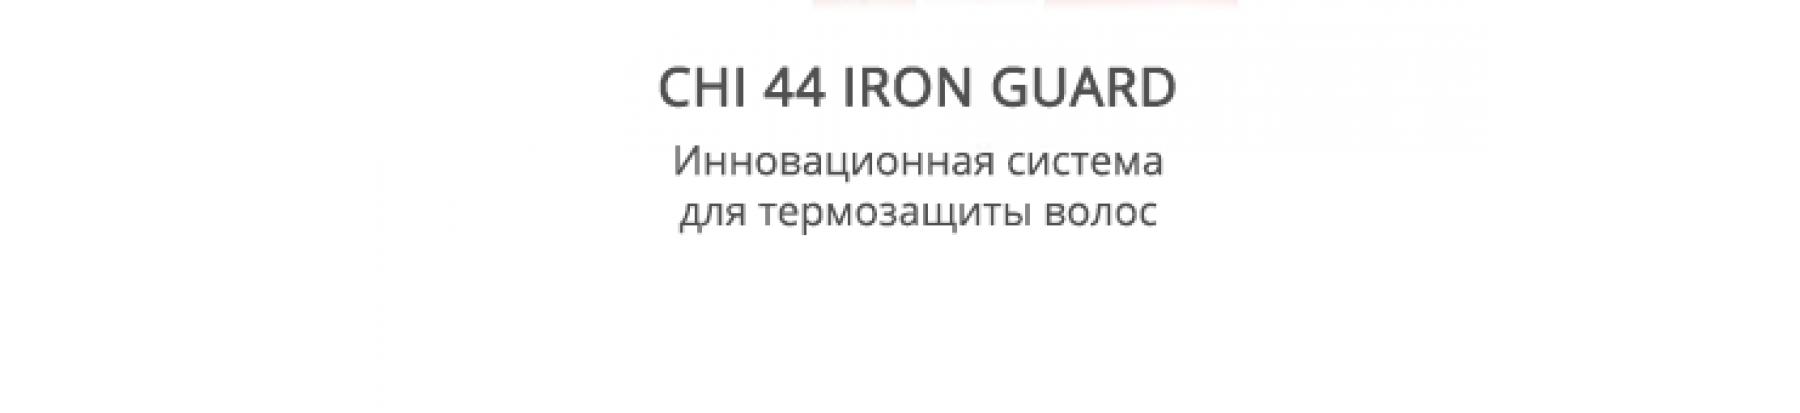 CHI 44 Iron Guard - Термозащита